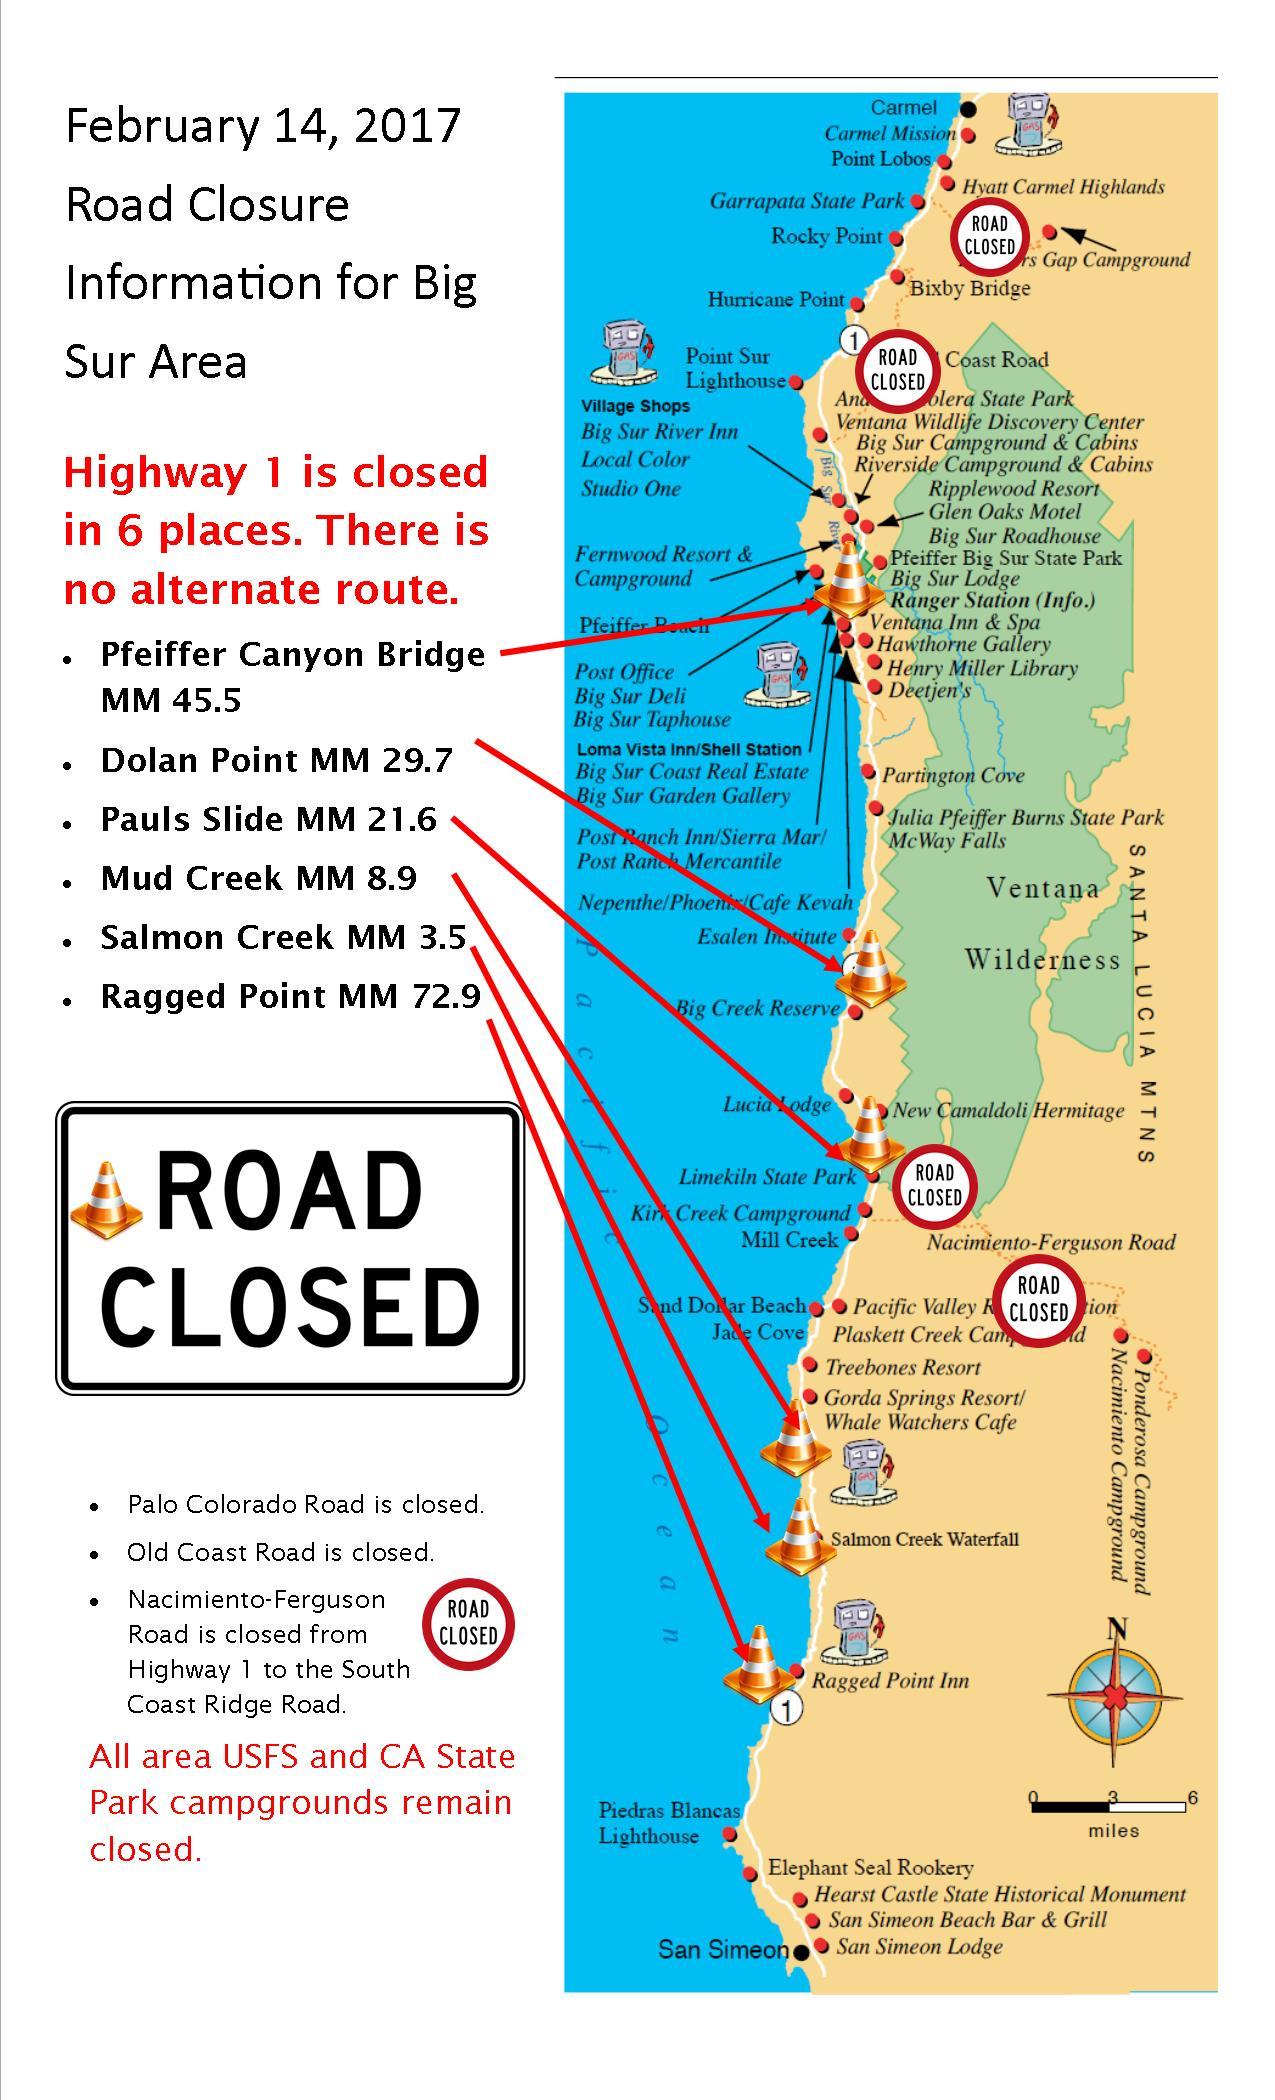 Visual Guide to Road Closures in Big Sur | Big Sur California